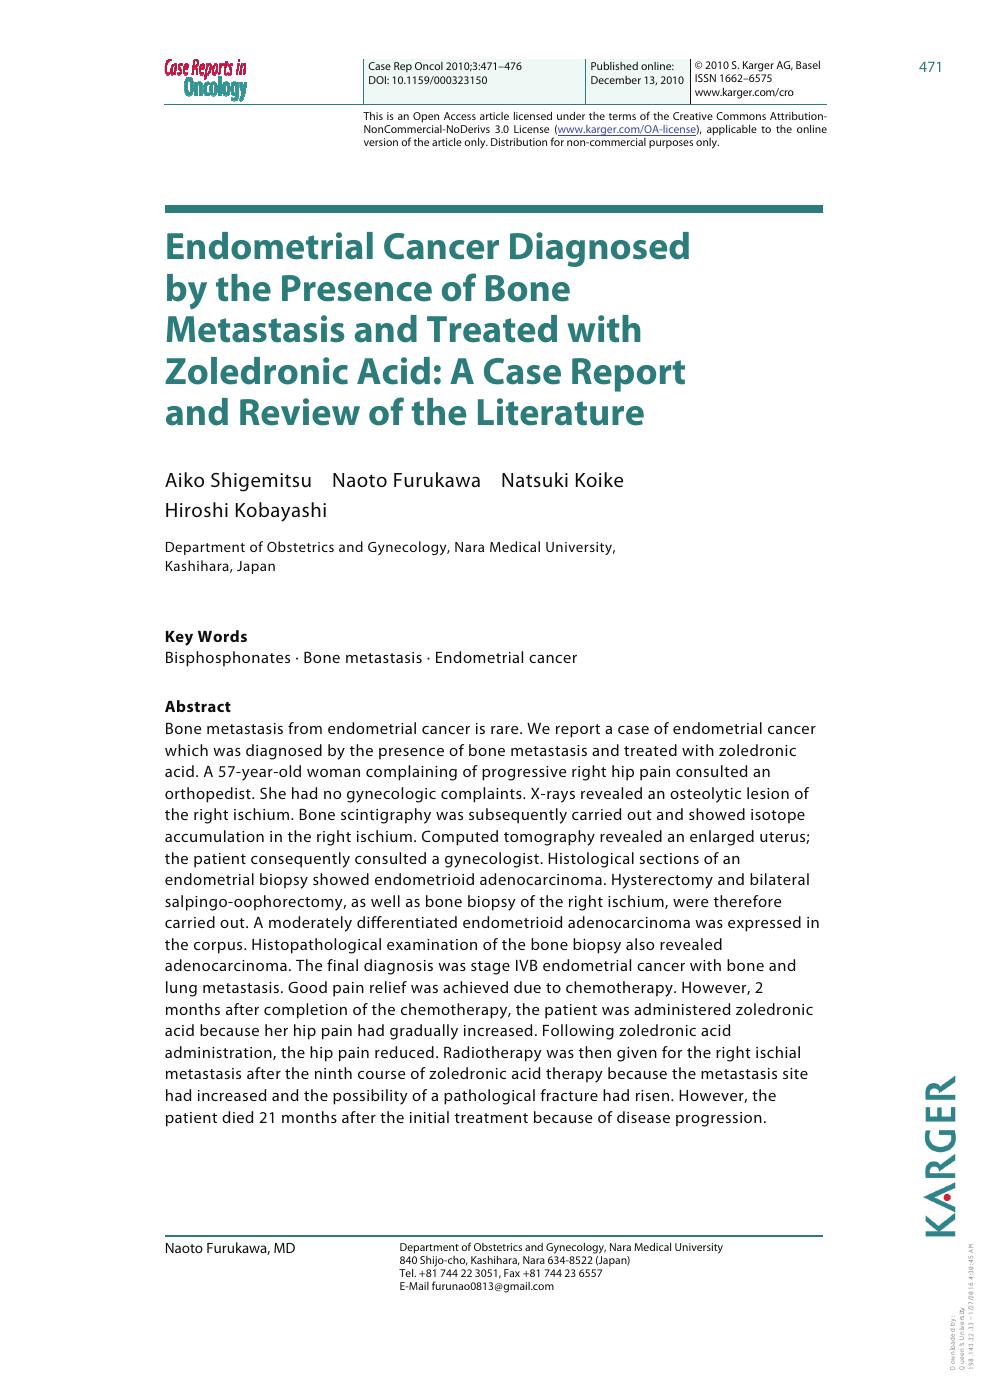 endometrial cancer metastasis to bone papillomavirus p16